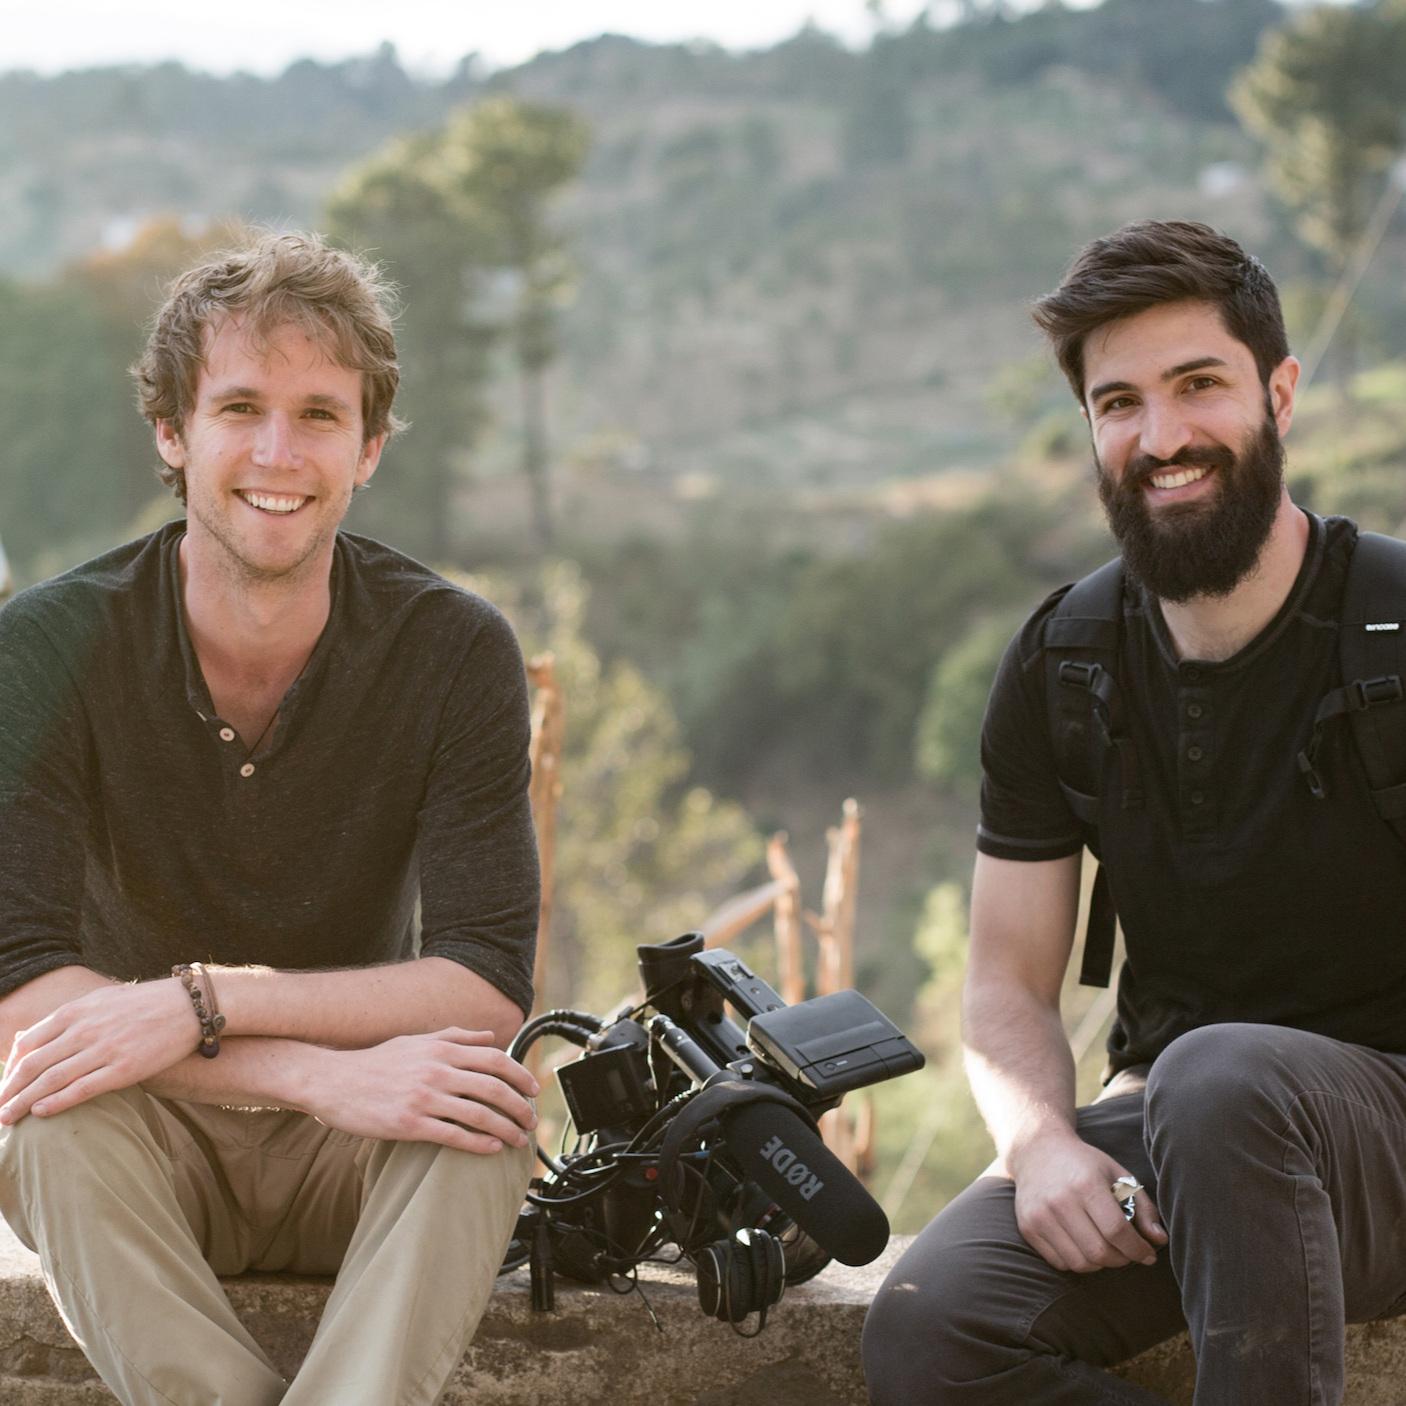 Chris Temple & Zach Ingrasci - Award-winning Documentarians